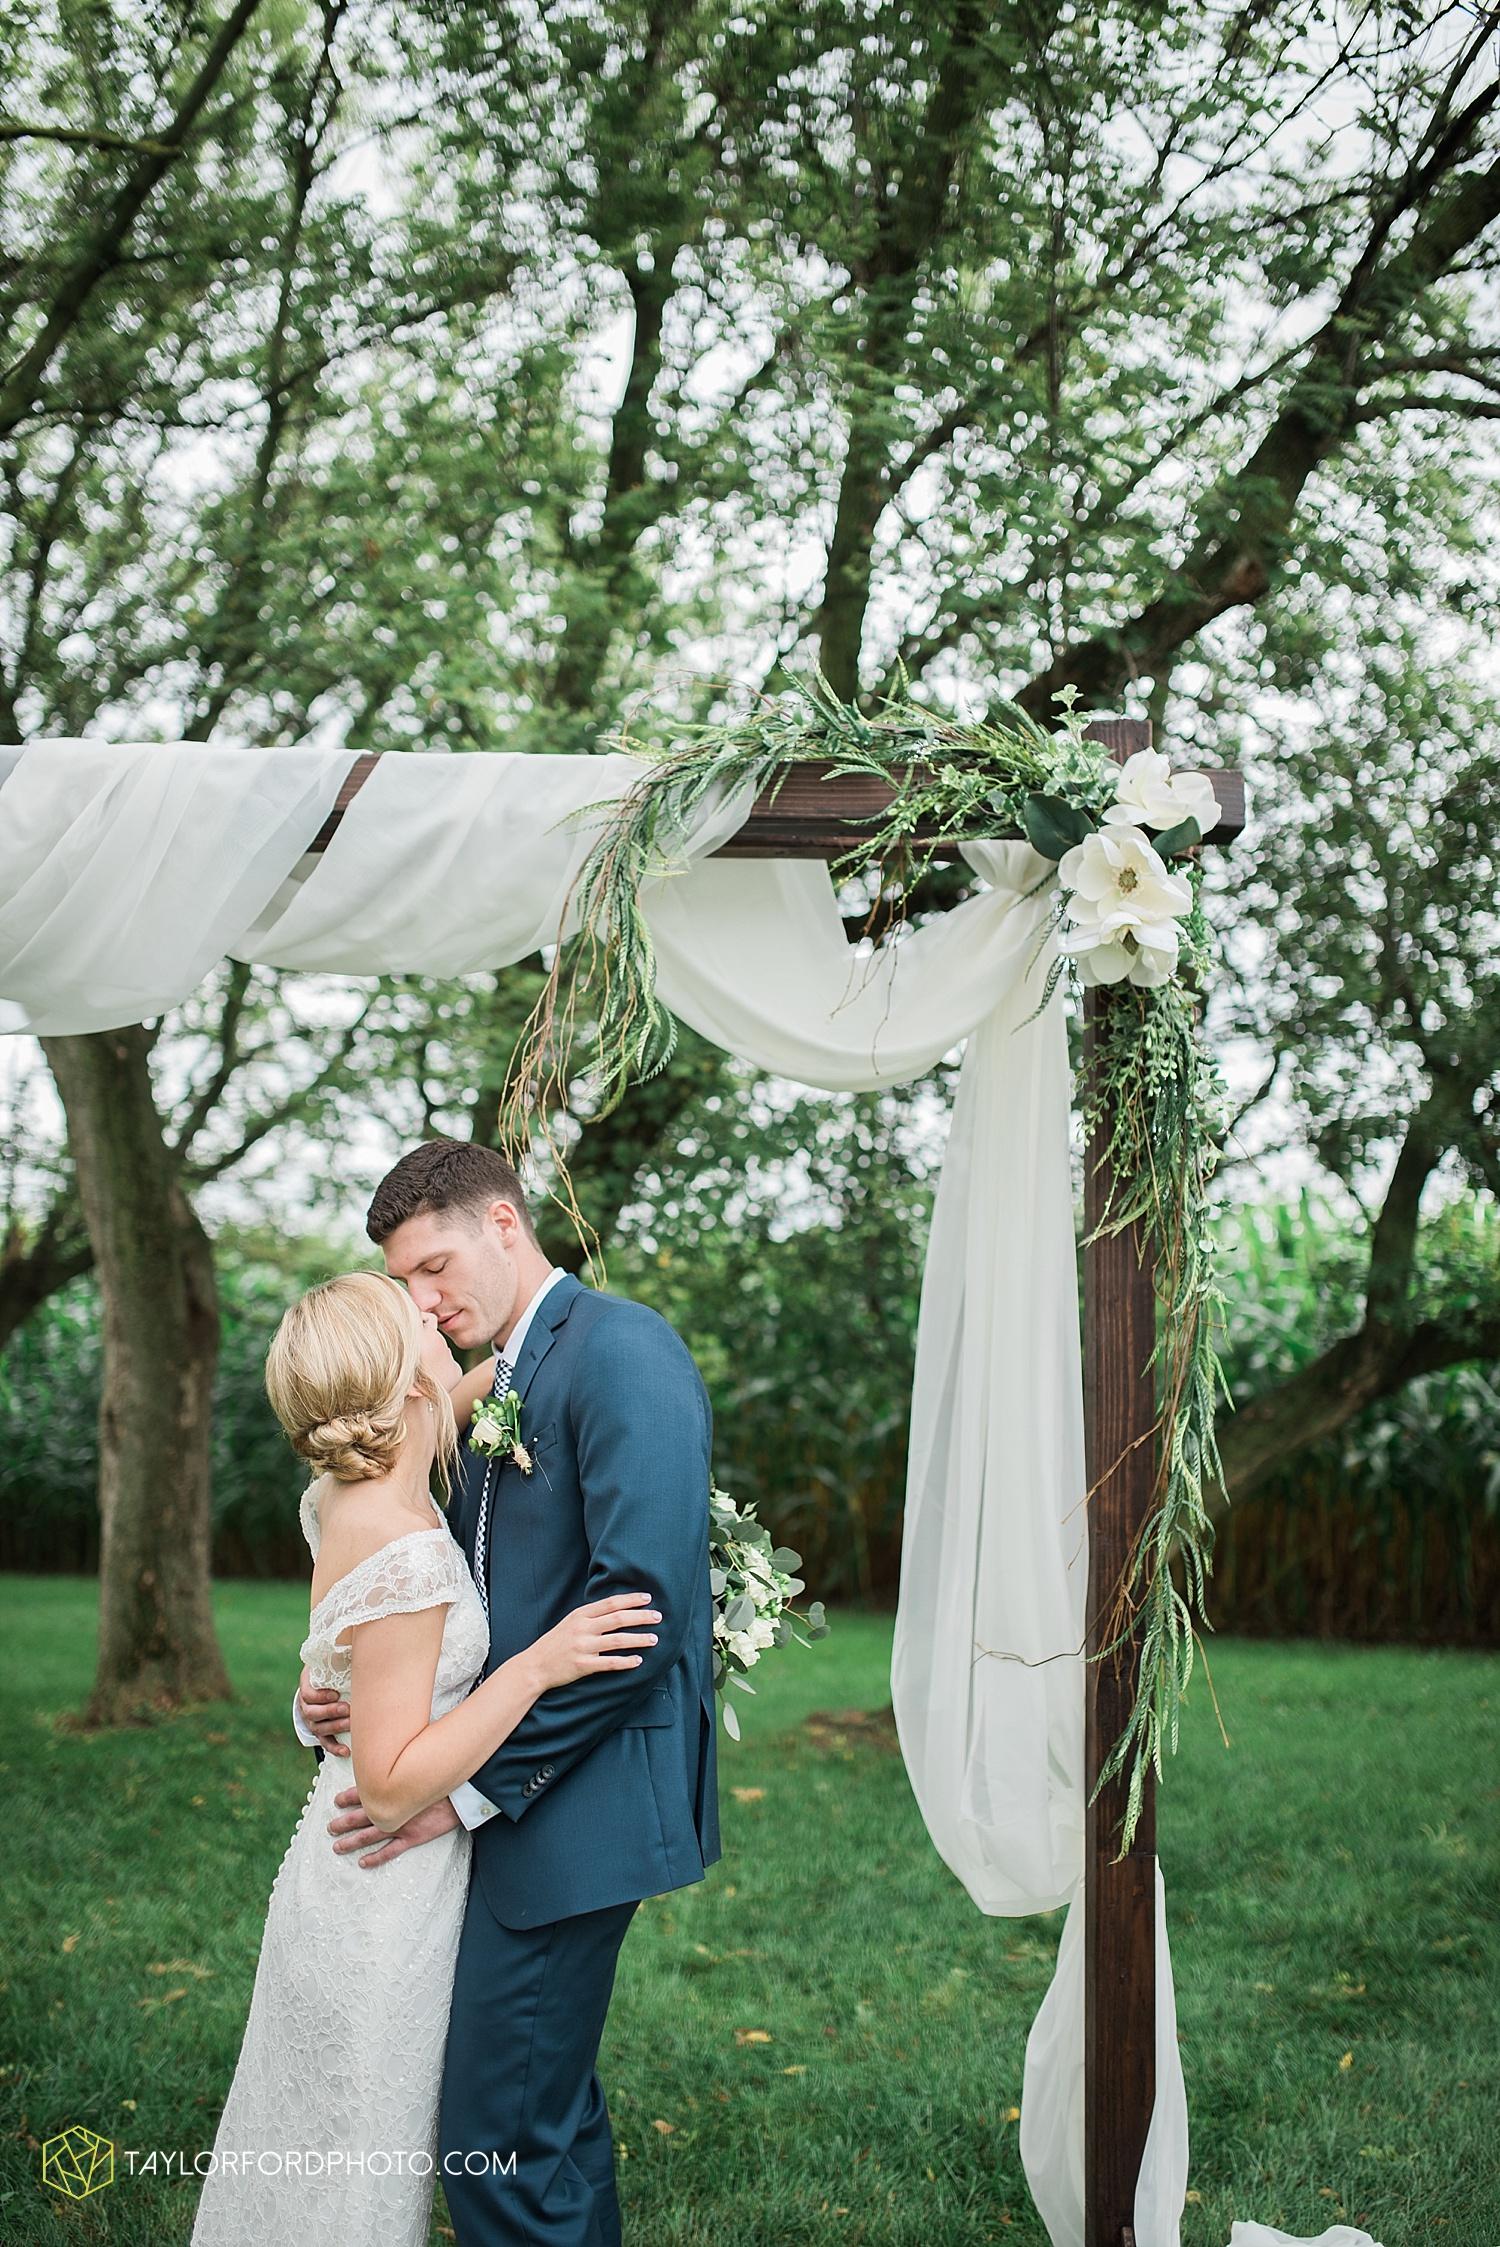 fort_wayne_indiana_van_wert_columbus_ohio_nashville_tennessee_photographer_taylor_ford_shoppes_at_old_mill_wedding_0721.jpg